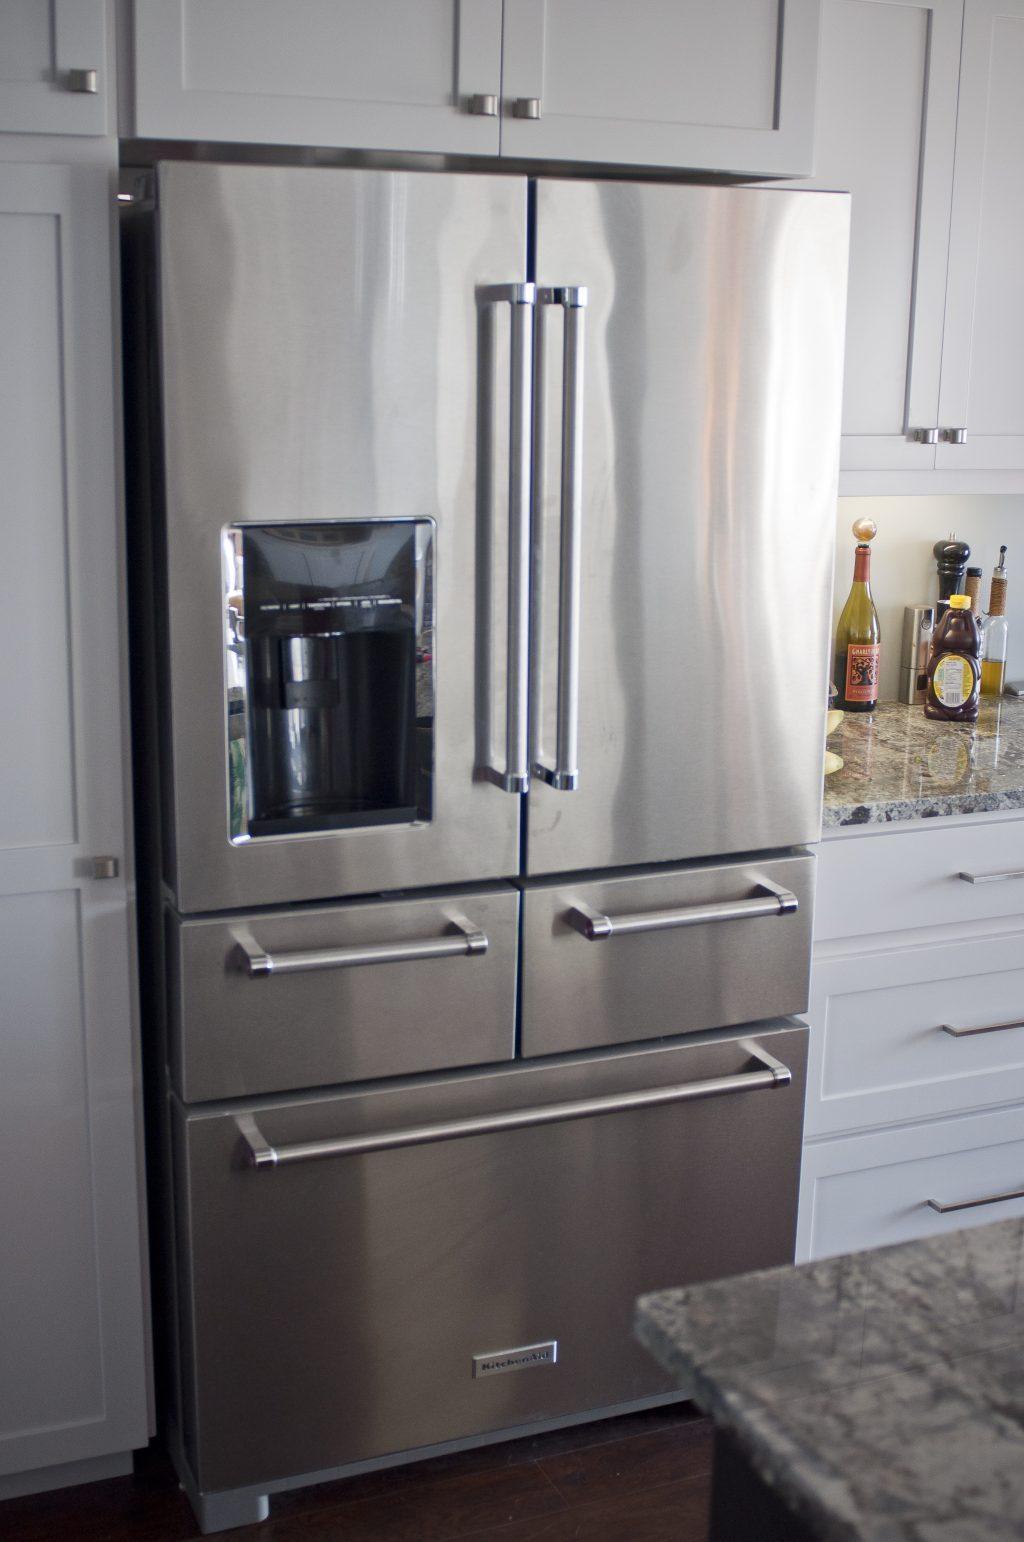 Home Hardware Reviews & Feedback | Wellington Home Hardware